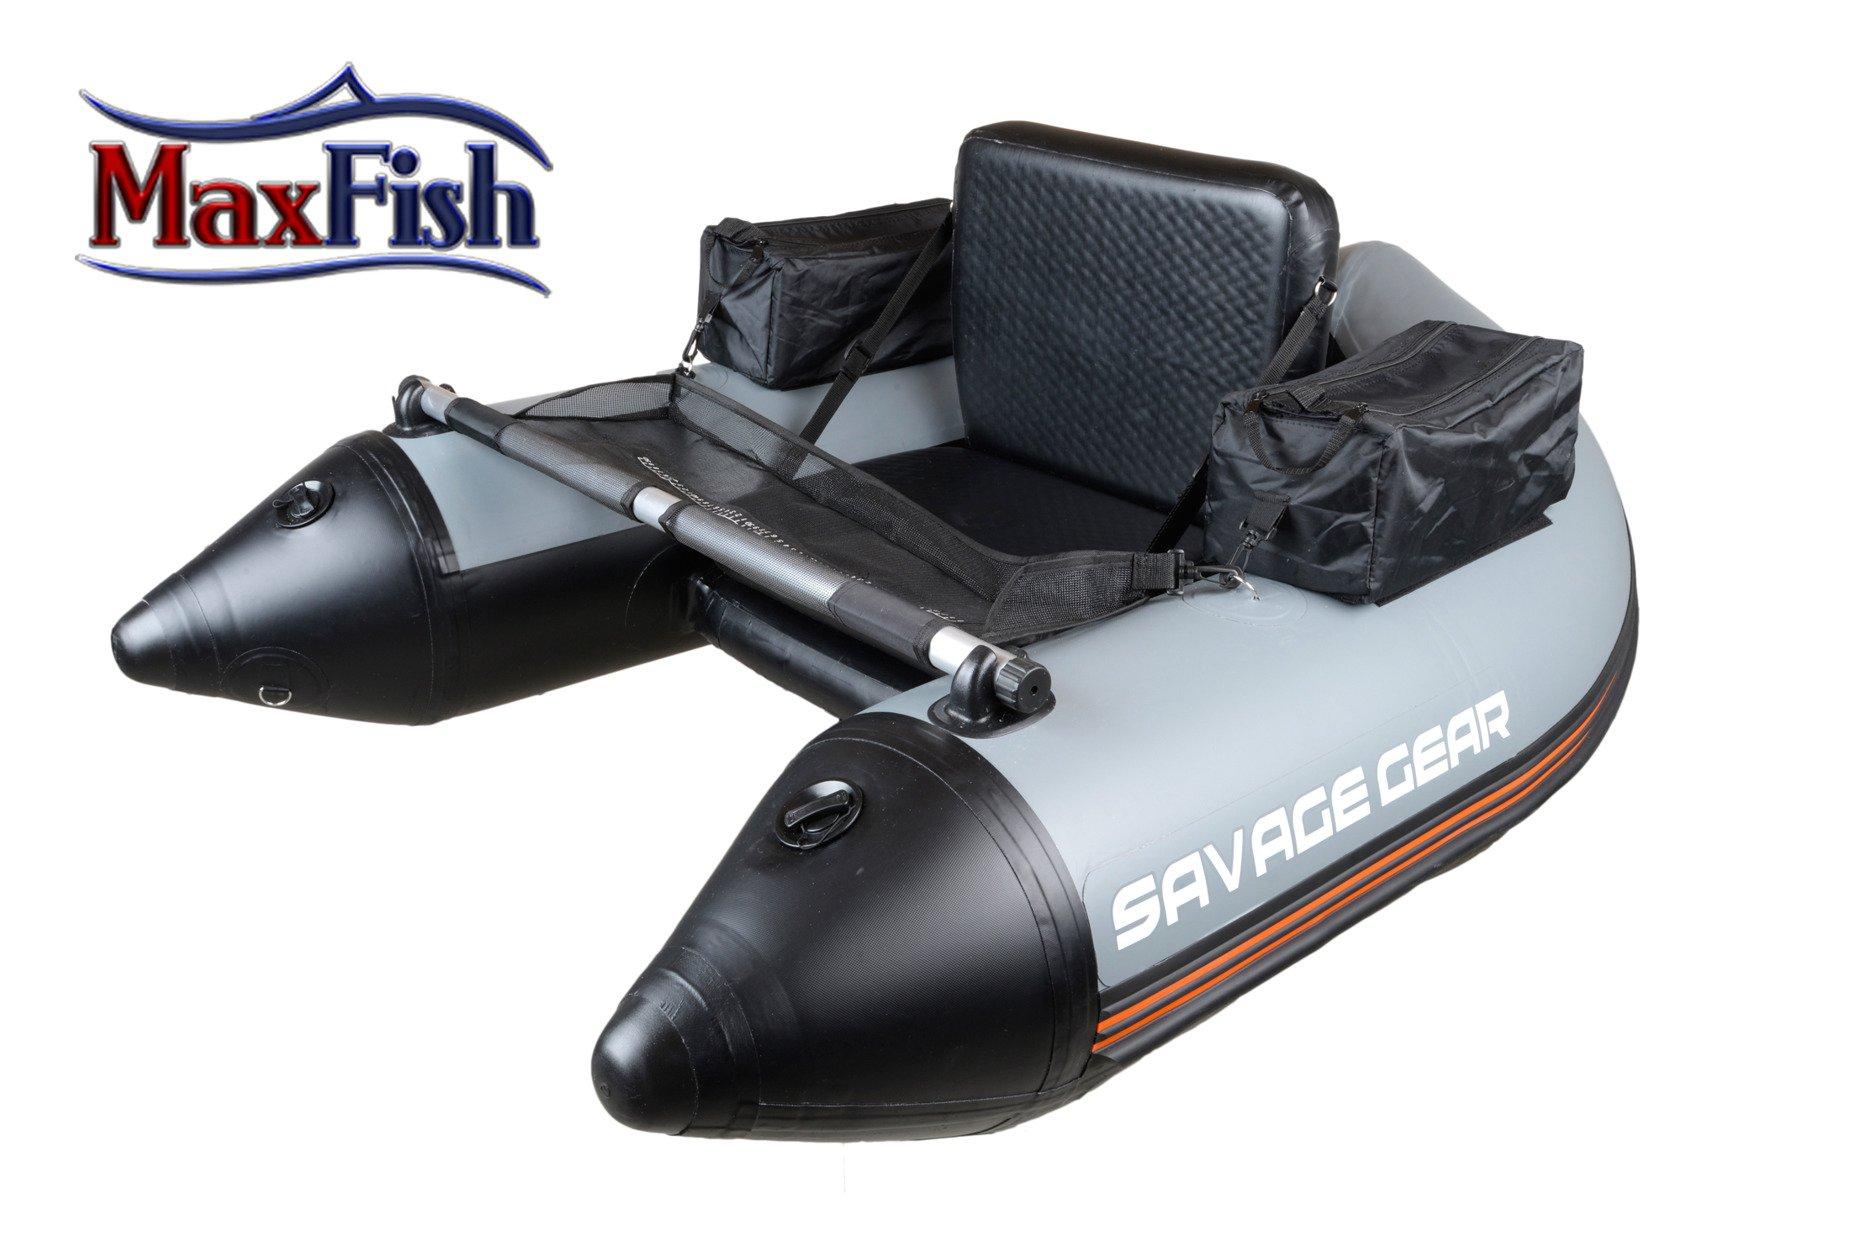 Savage Gear Belly Boat Hight Rider 150cm